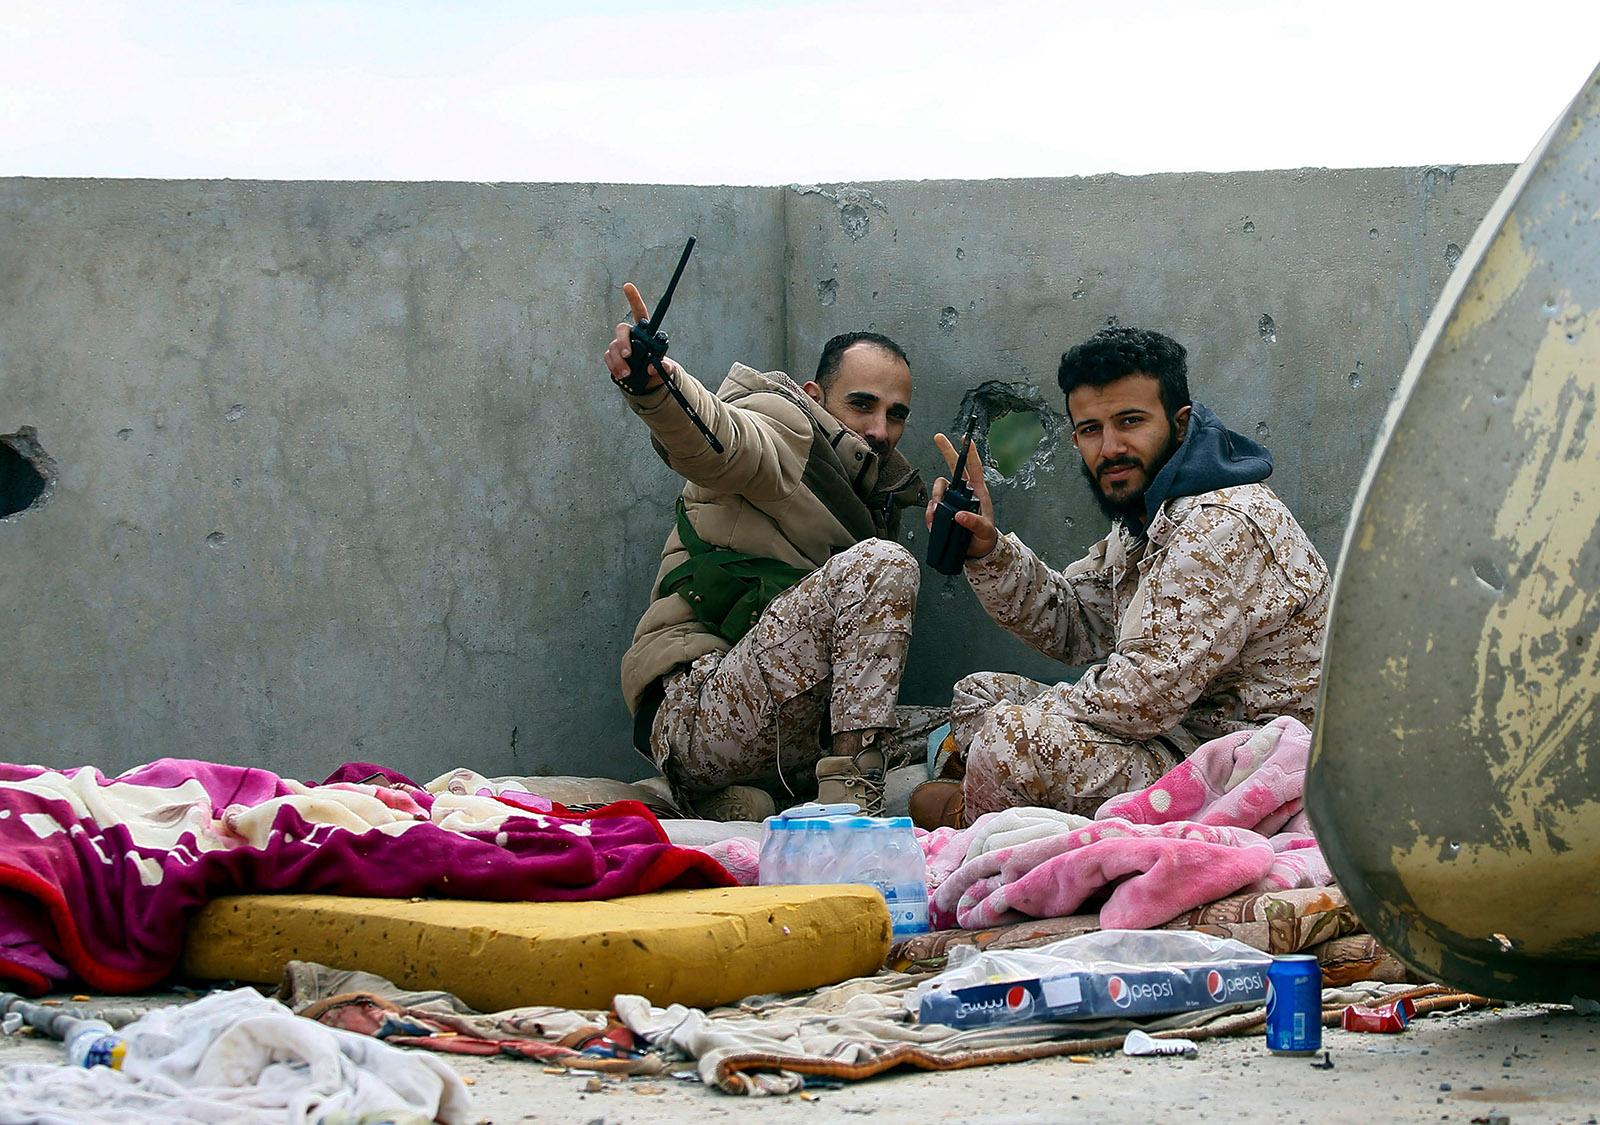 Turkey Deploys More Syrian Militants In Libya As Many Return In Coffins